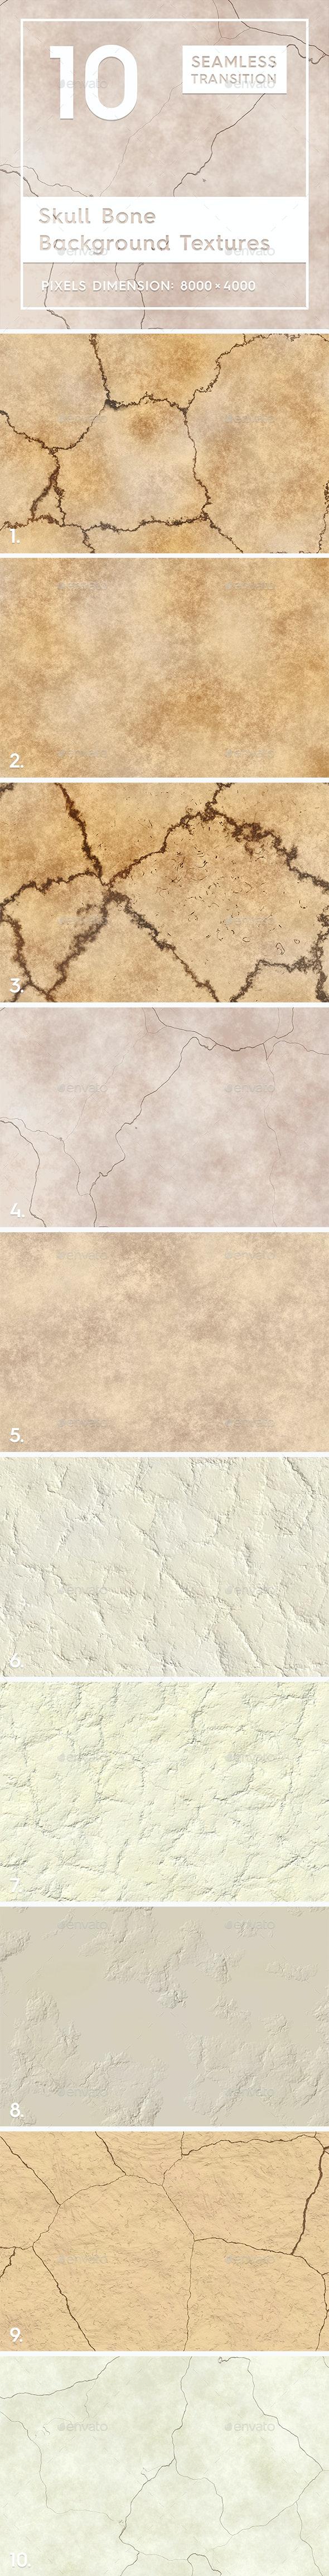 10 Skull Bone Background Textures - Nature Backgrounds